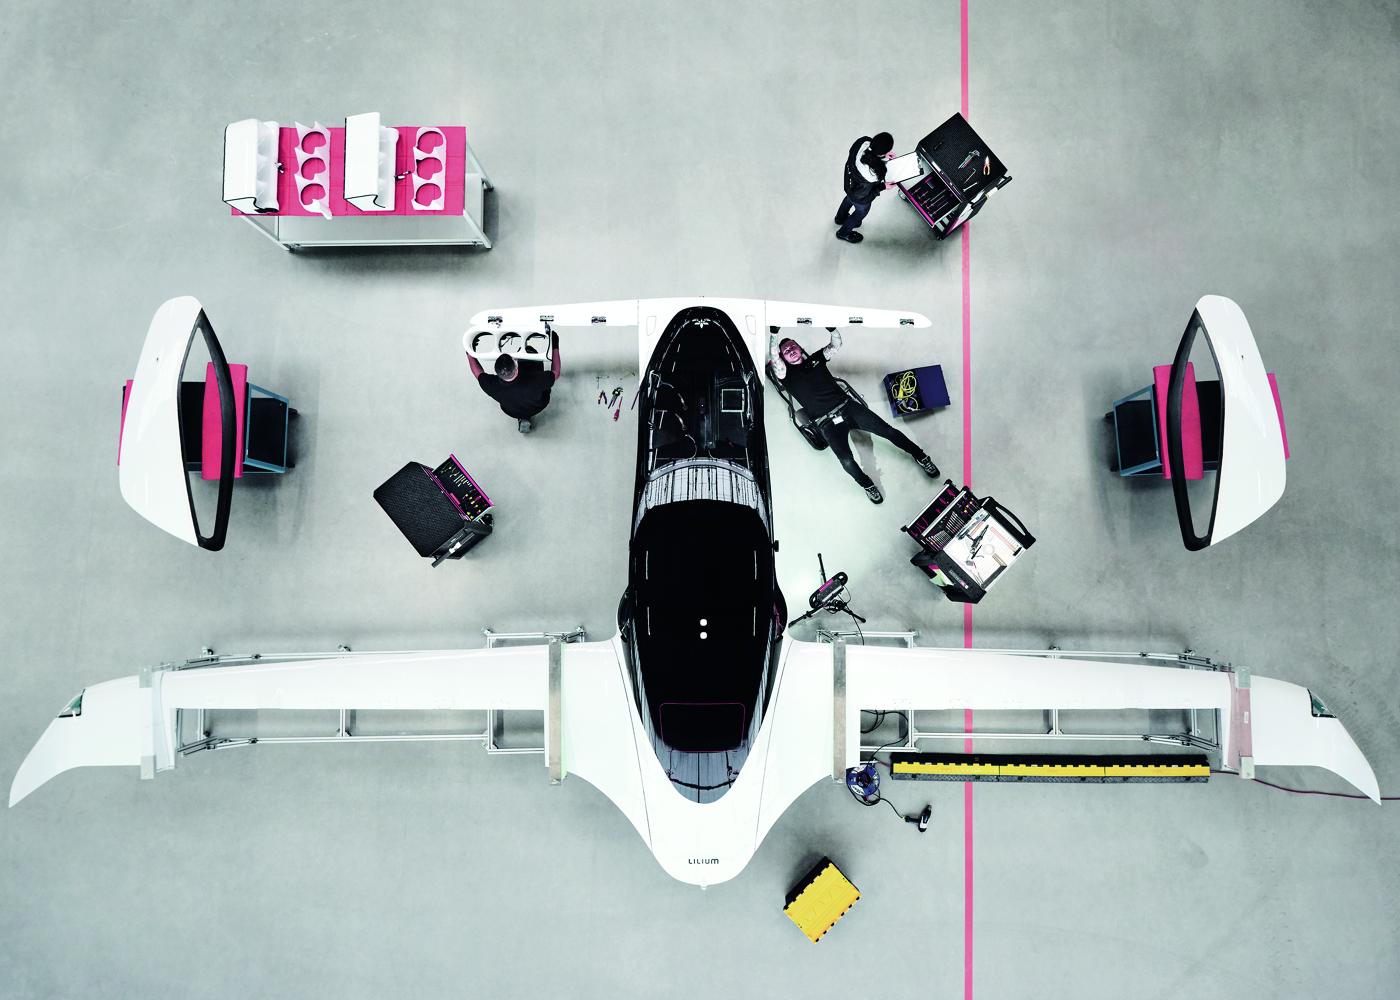 eVTOL Lilium Jet - overhead view